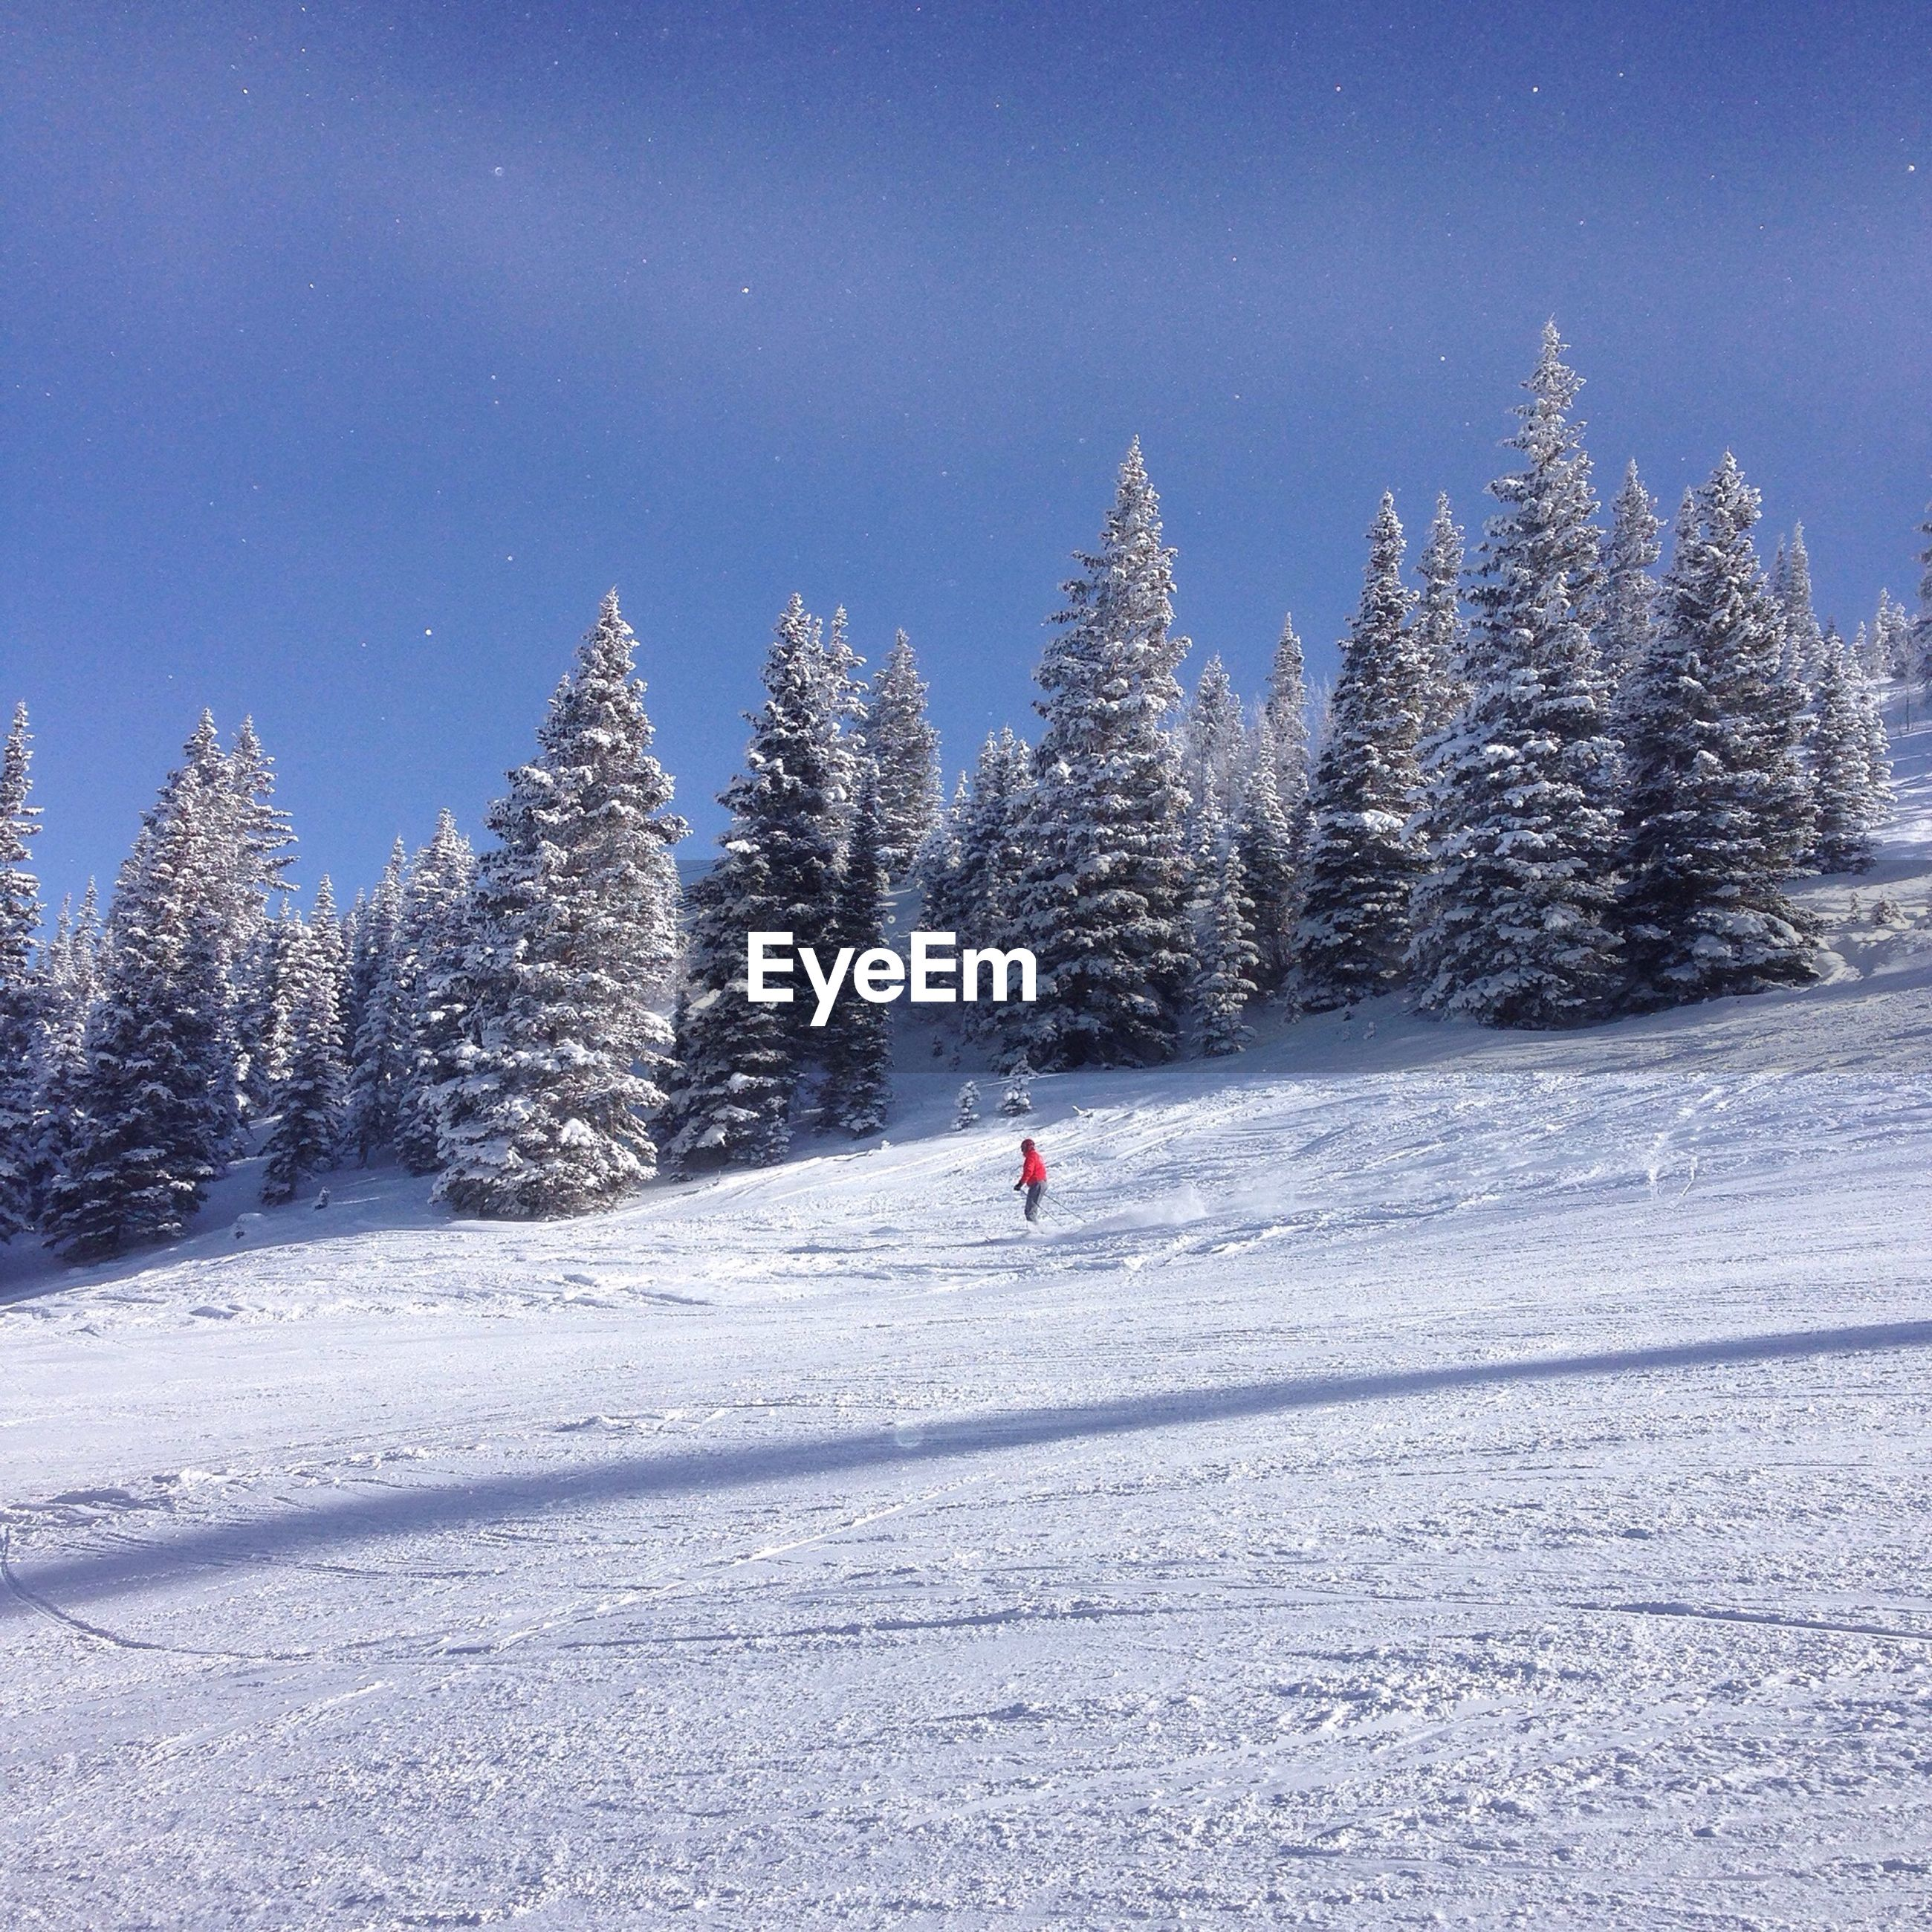 Man snowboarding on mountains during winter